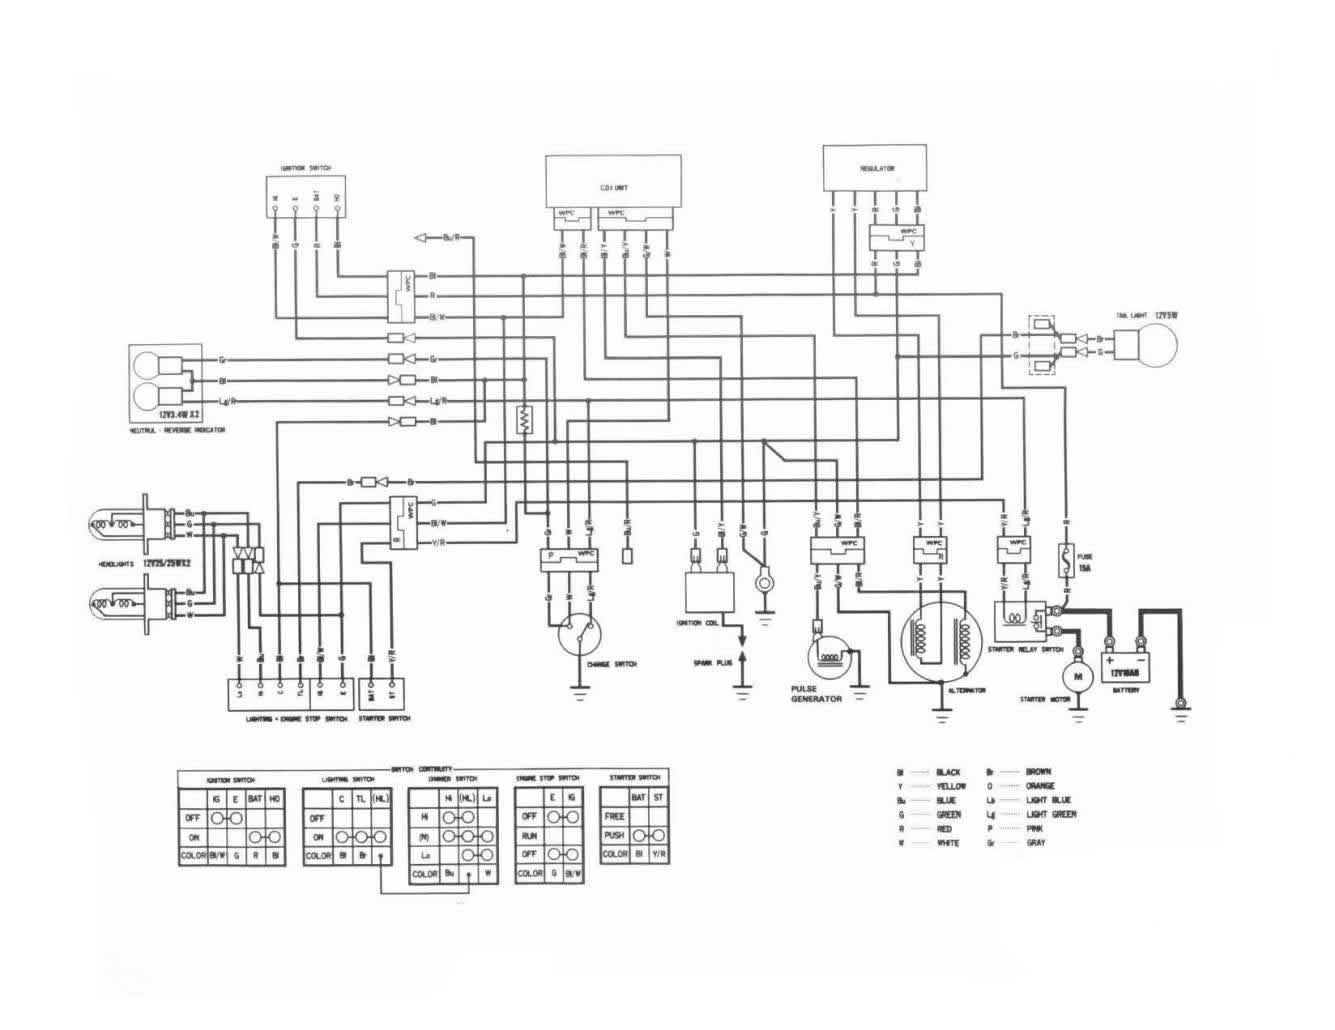 TRX200_wiring?resize=665%2C513 fascinating honda trx 200 wiring diagram photos wiring schematic honda trx200 wiring diagram at mifinder.co